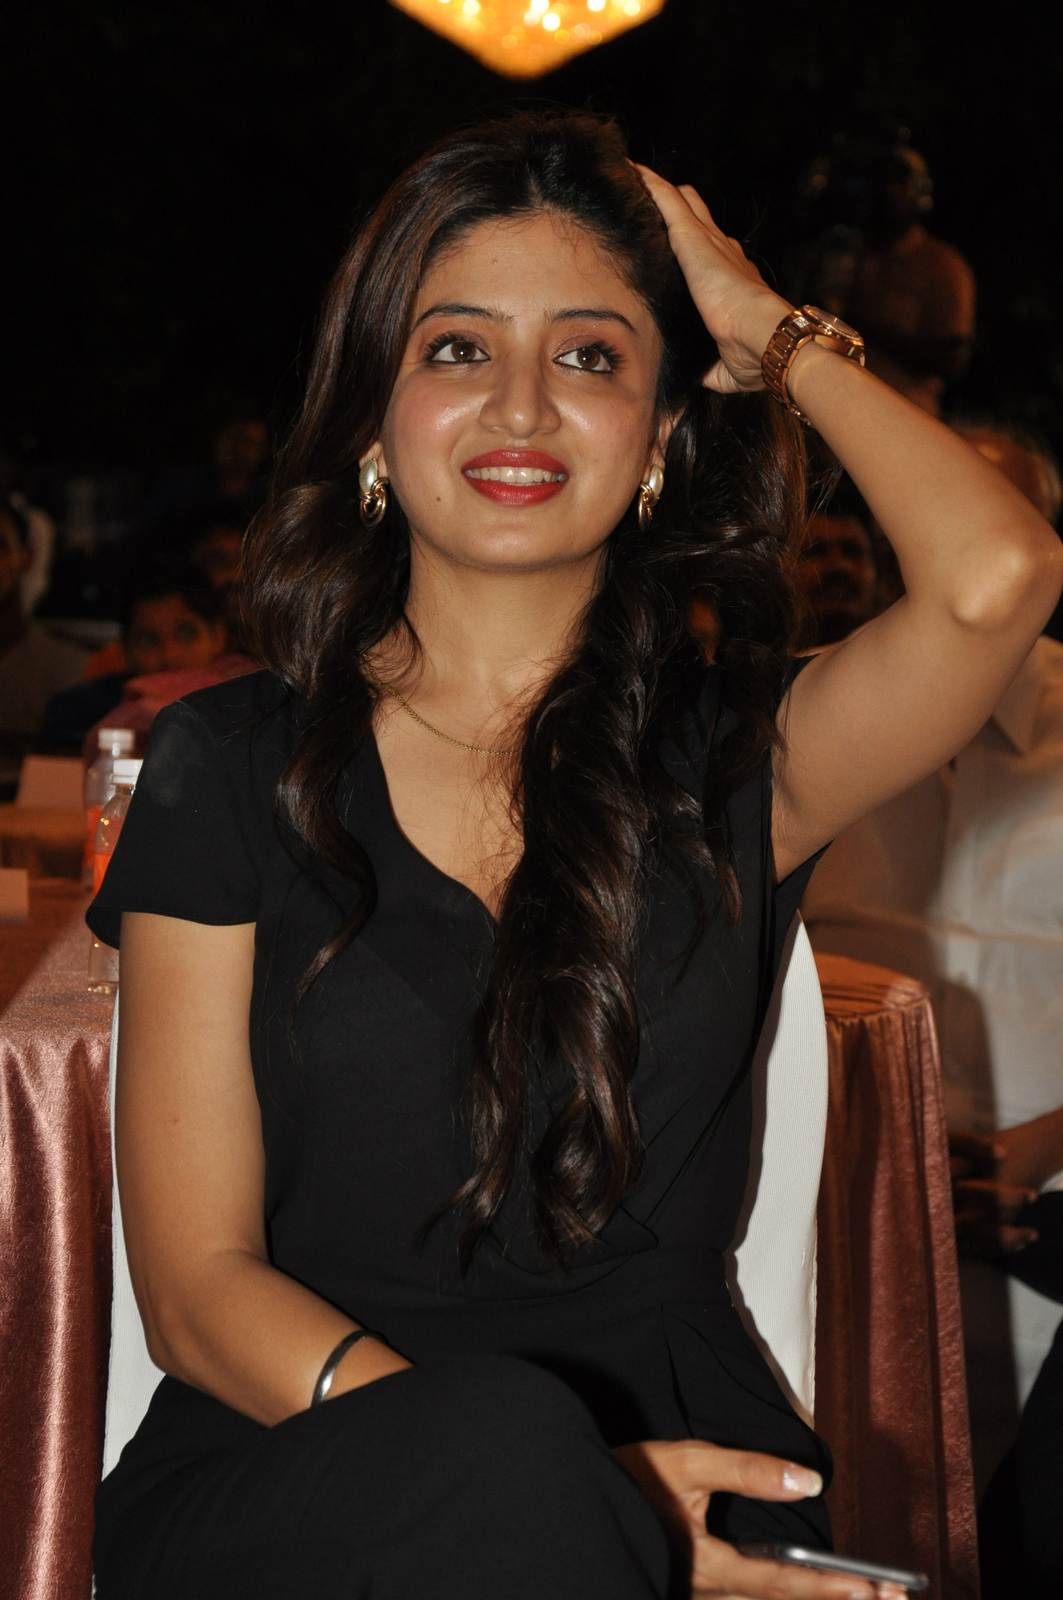 Telugu Actress Poonam Kaur, Poonam Kaur hot Pics in black Dress from 365 Days Movie Audio Launch